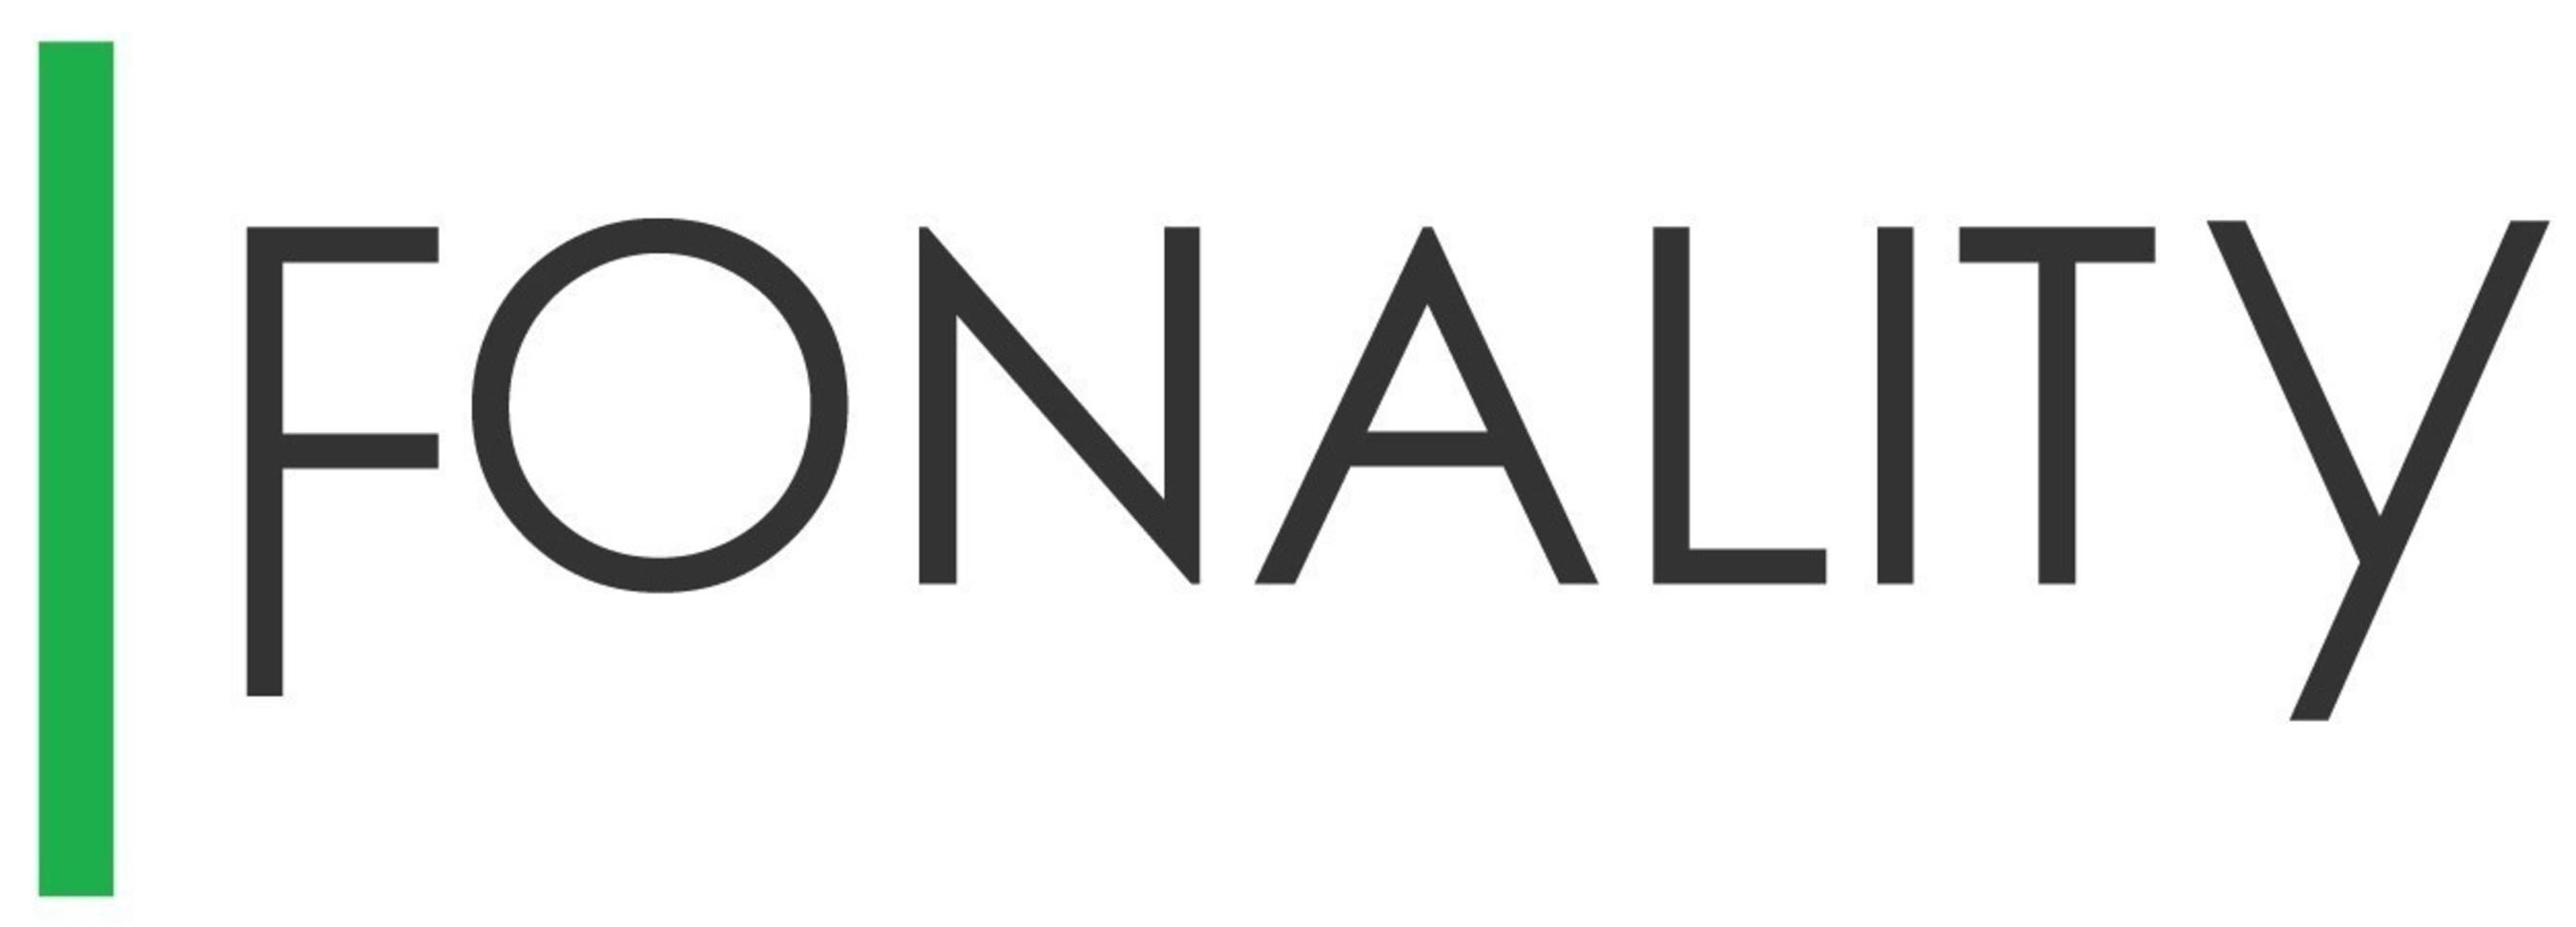 Fonality Logo.